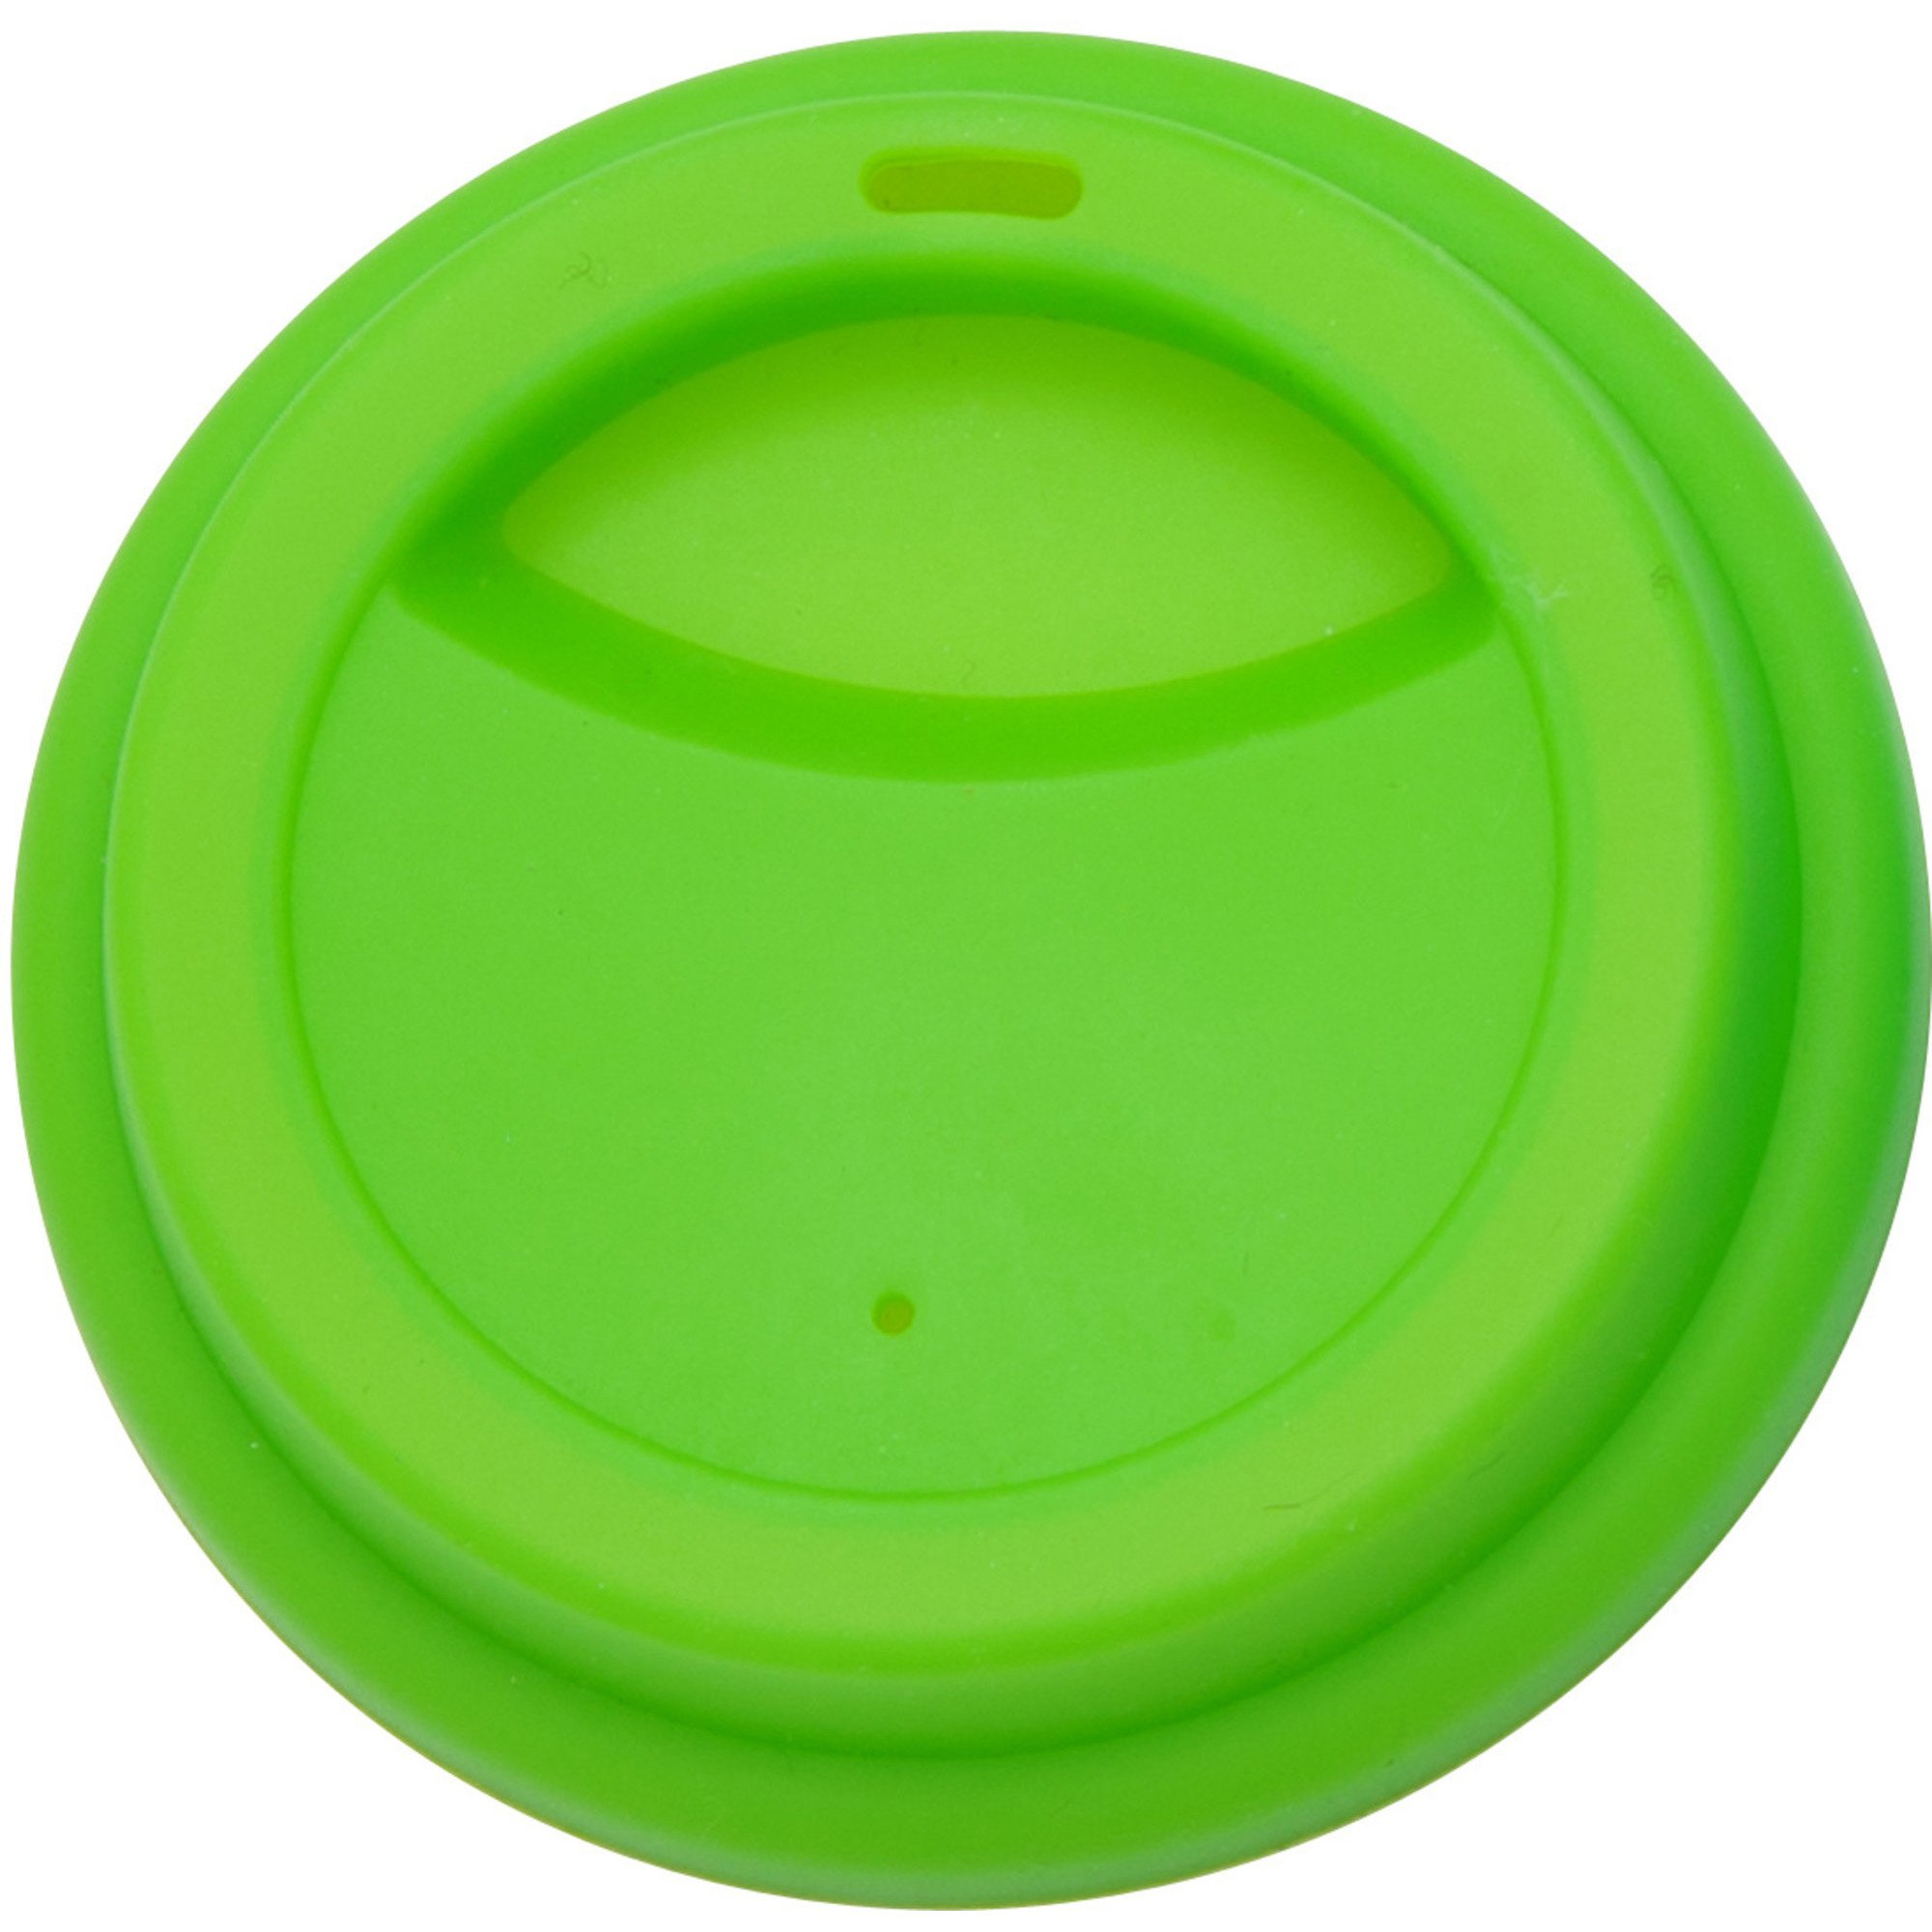 Rice Silikonlock för lattemugg Grön